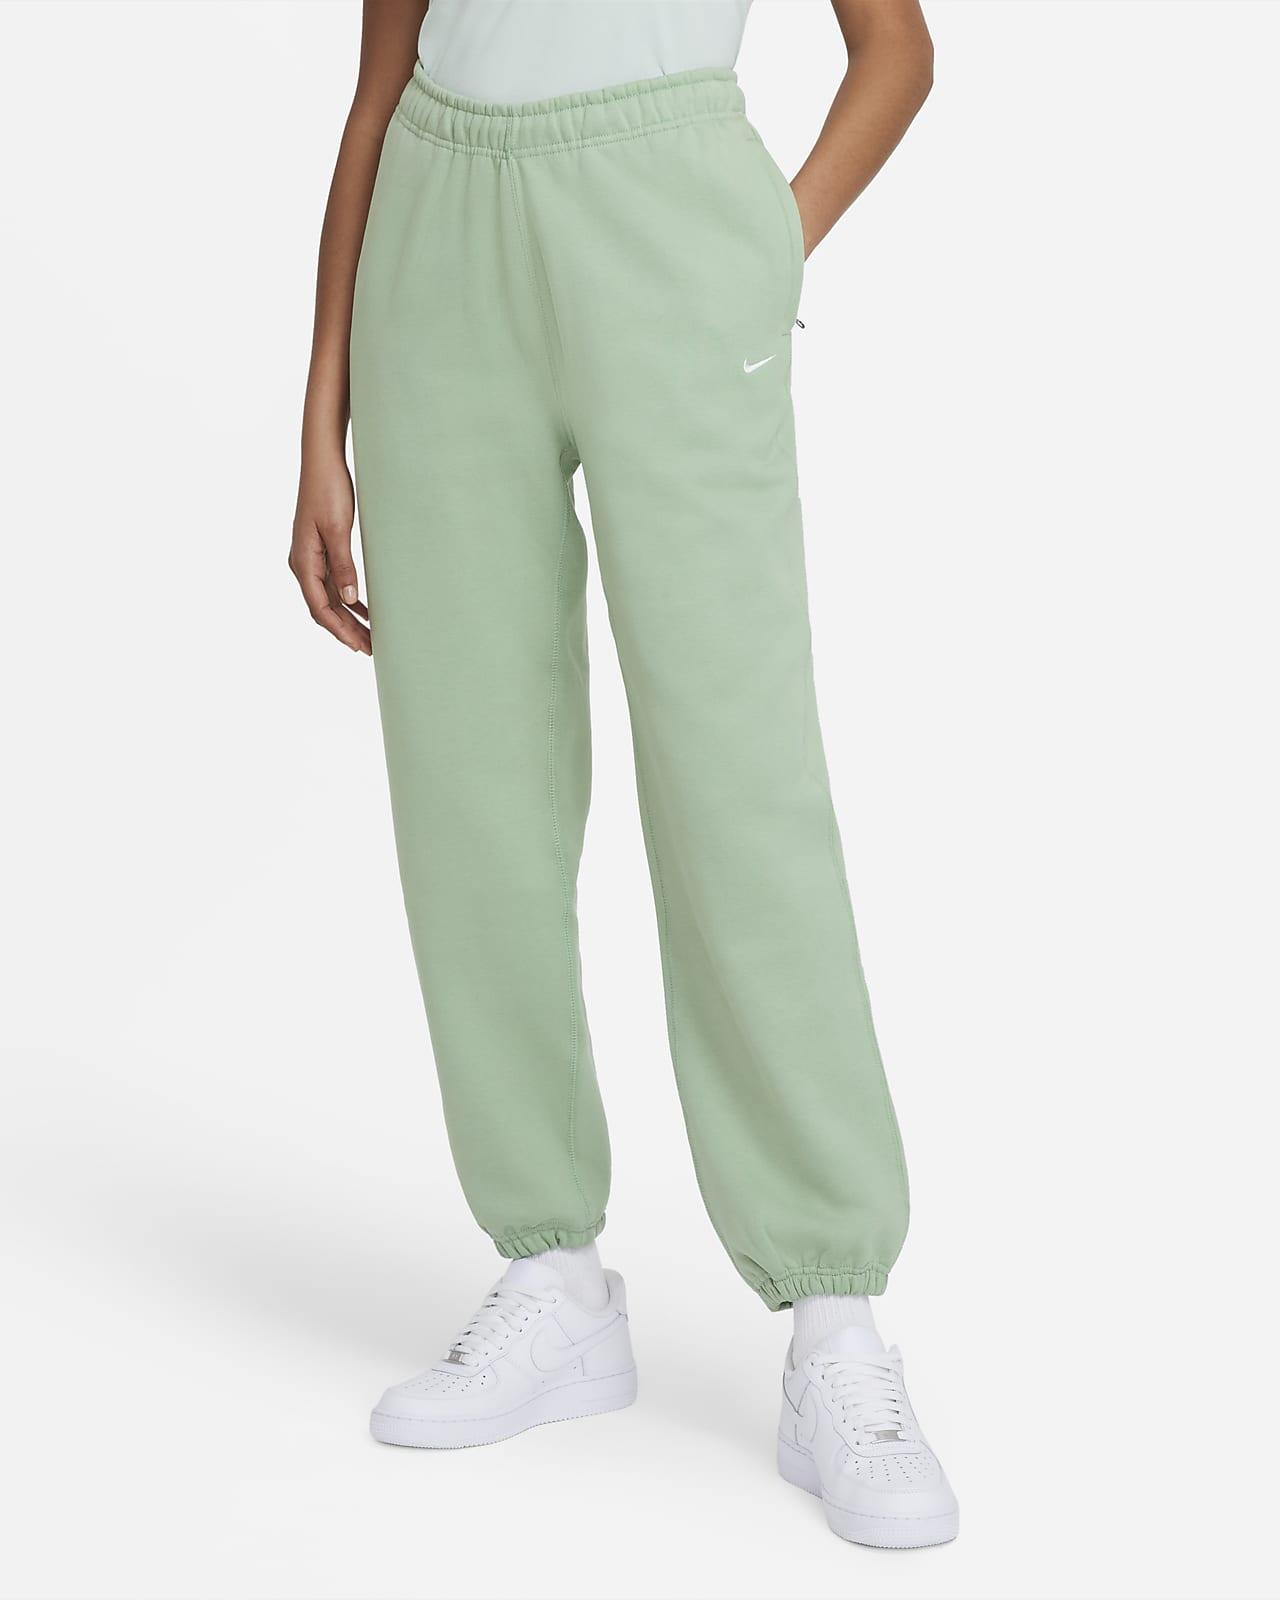 Pantalon en tissu Fleece NikeLab pour Femme